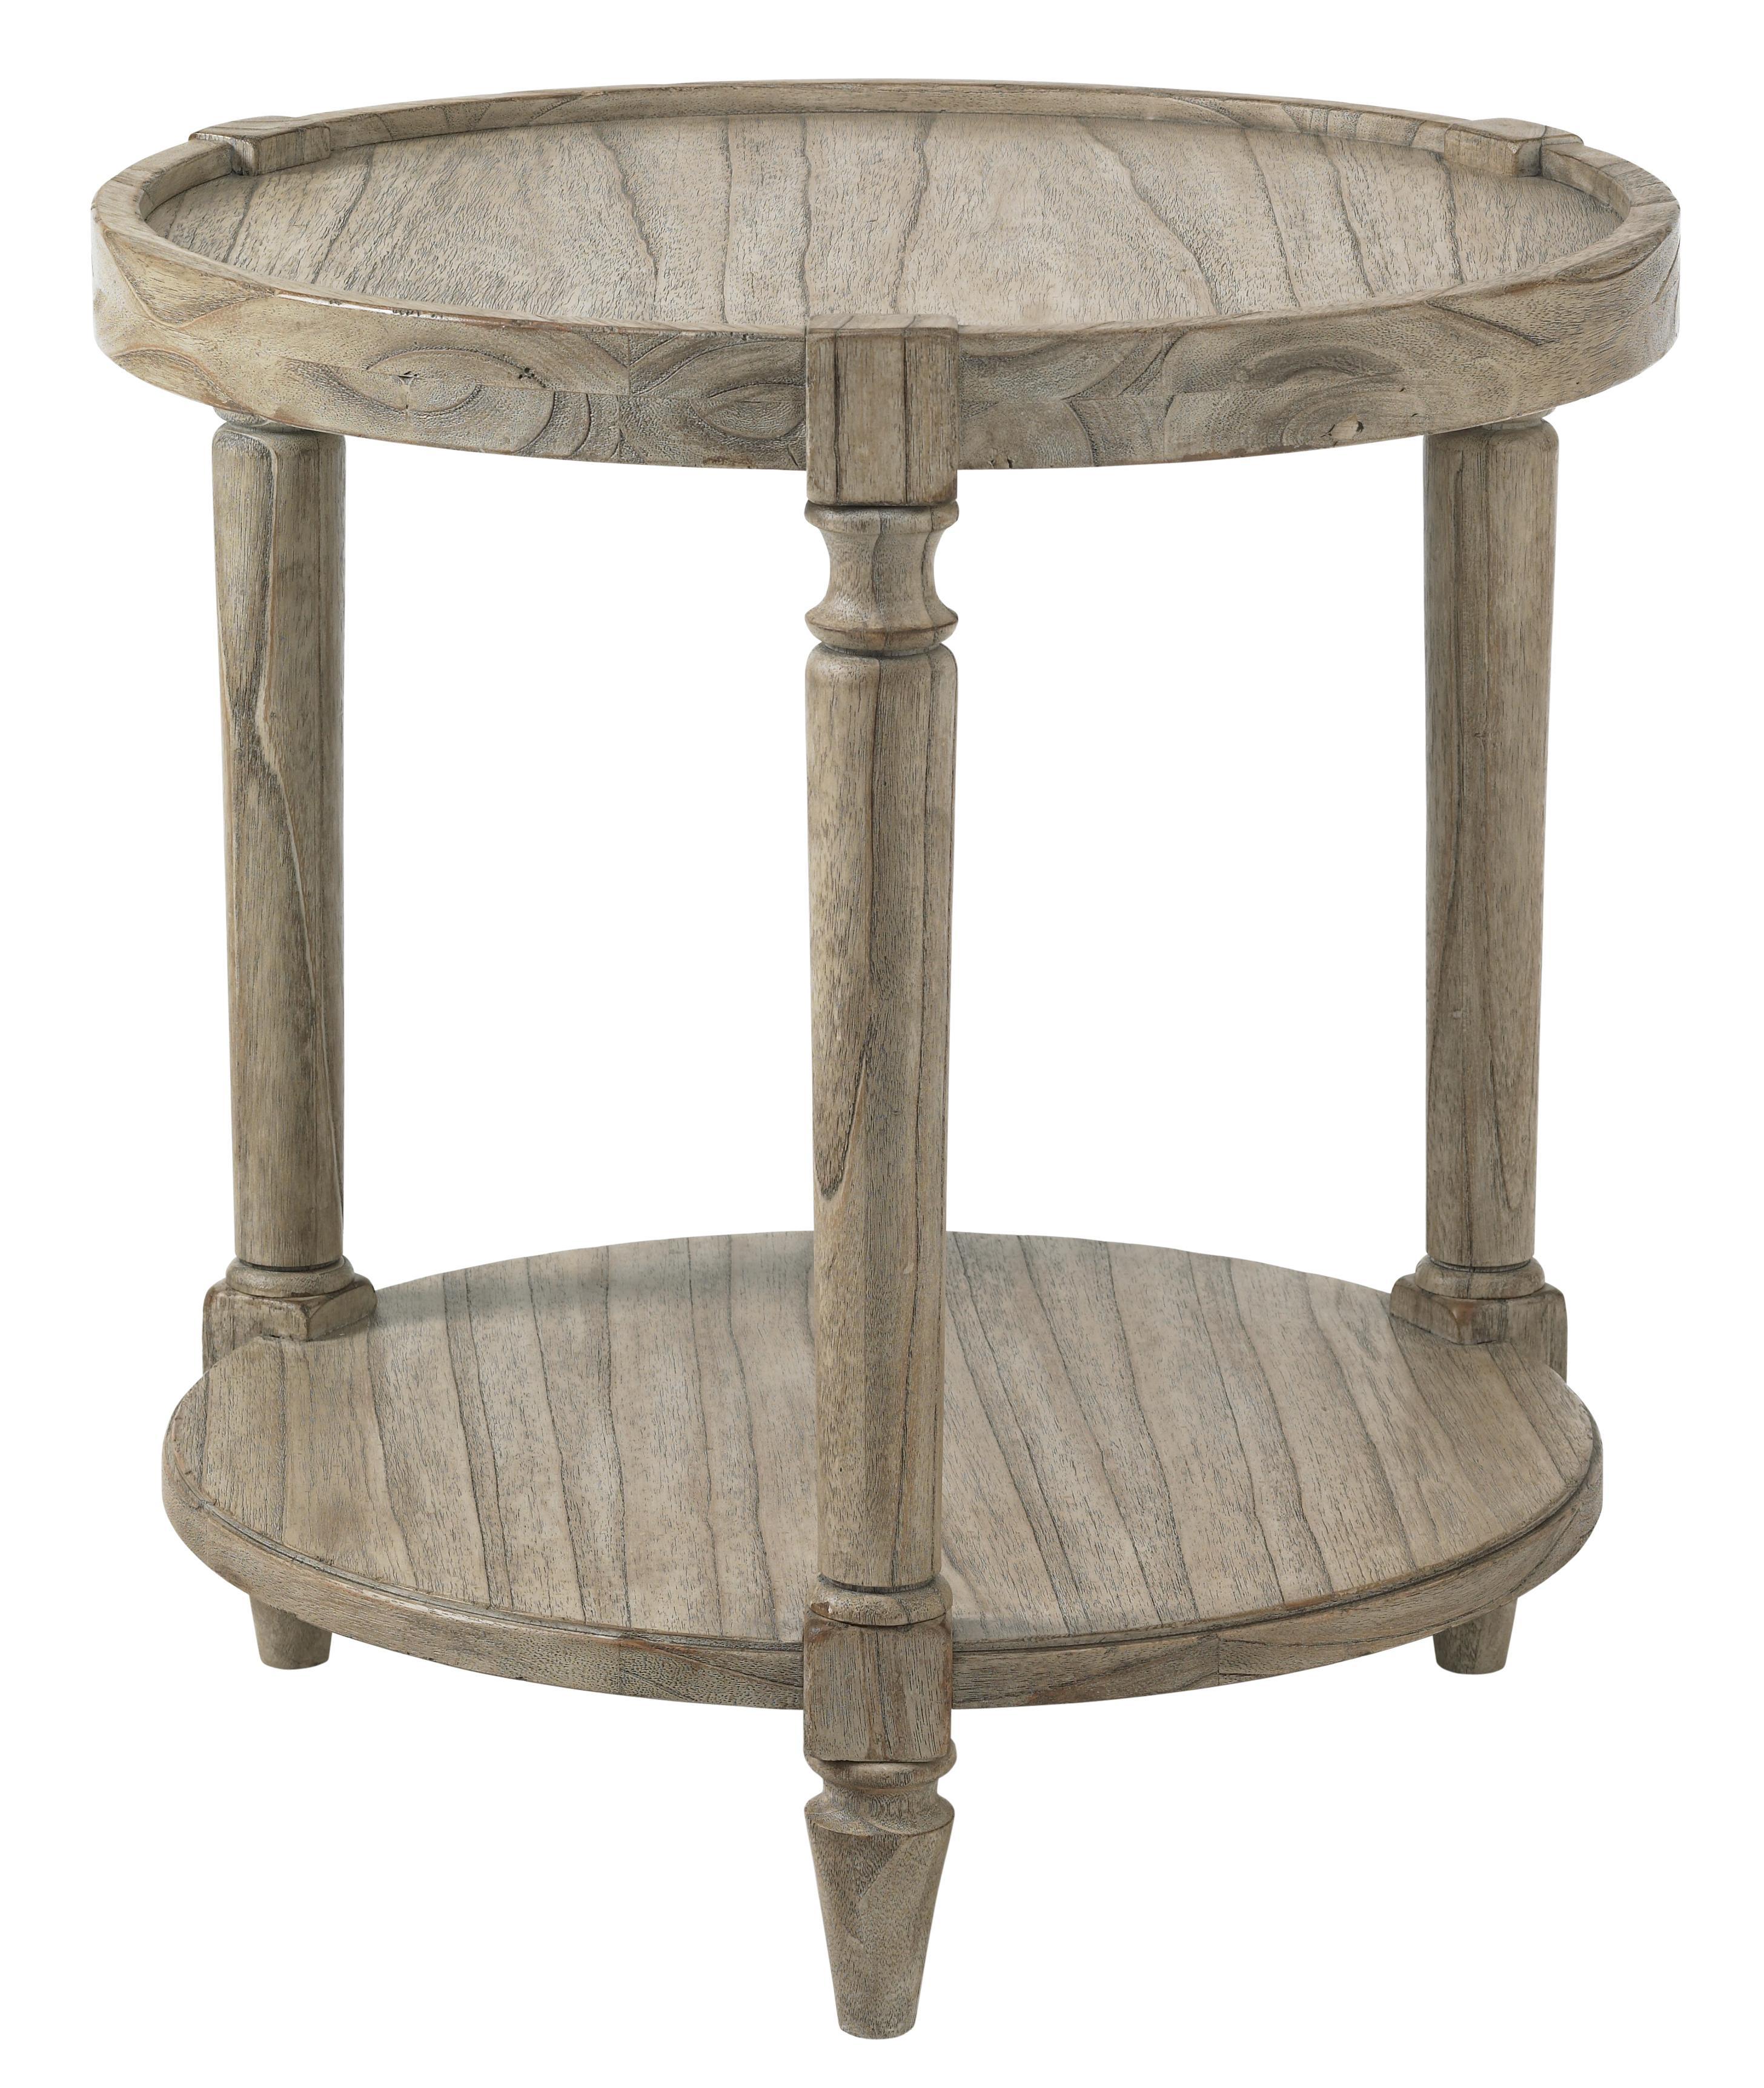 Twilight Bay Phoebe Lamp Table by Lexington at Johnny Janosik